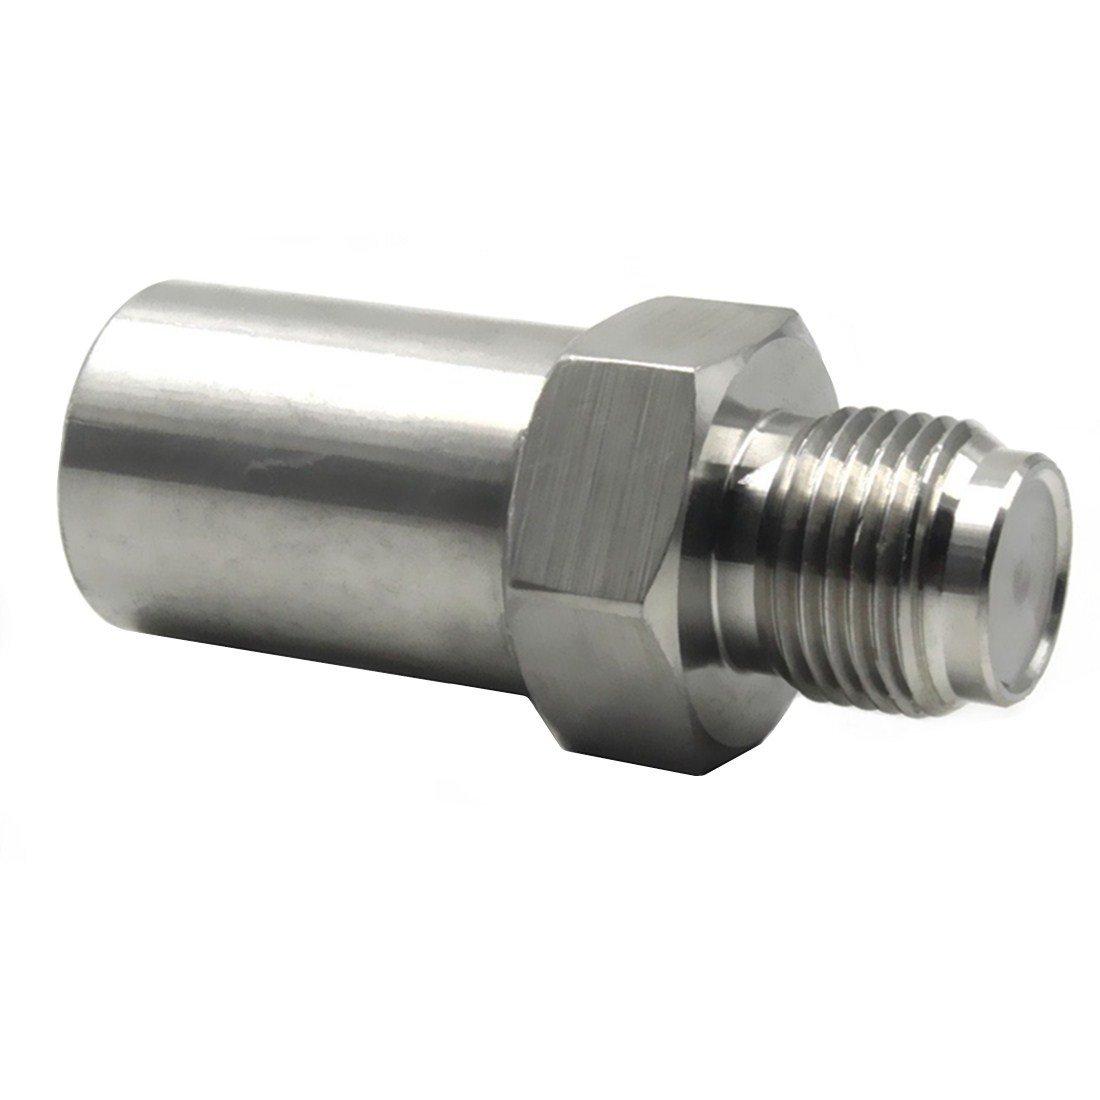 Amazon com: TamerX 14mm Diesel Fuel Injector Cap / Block-Off